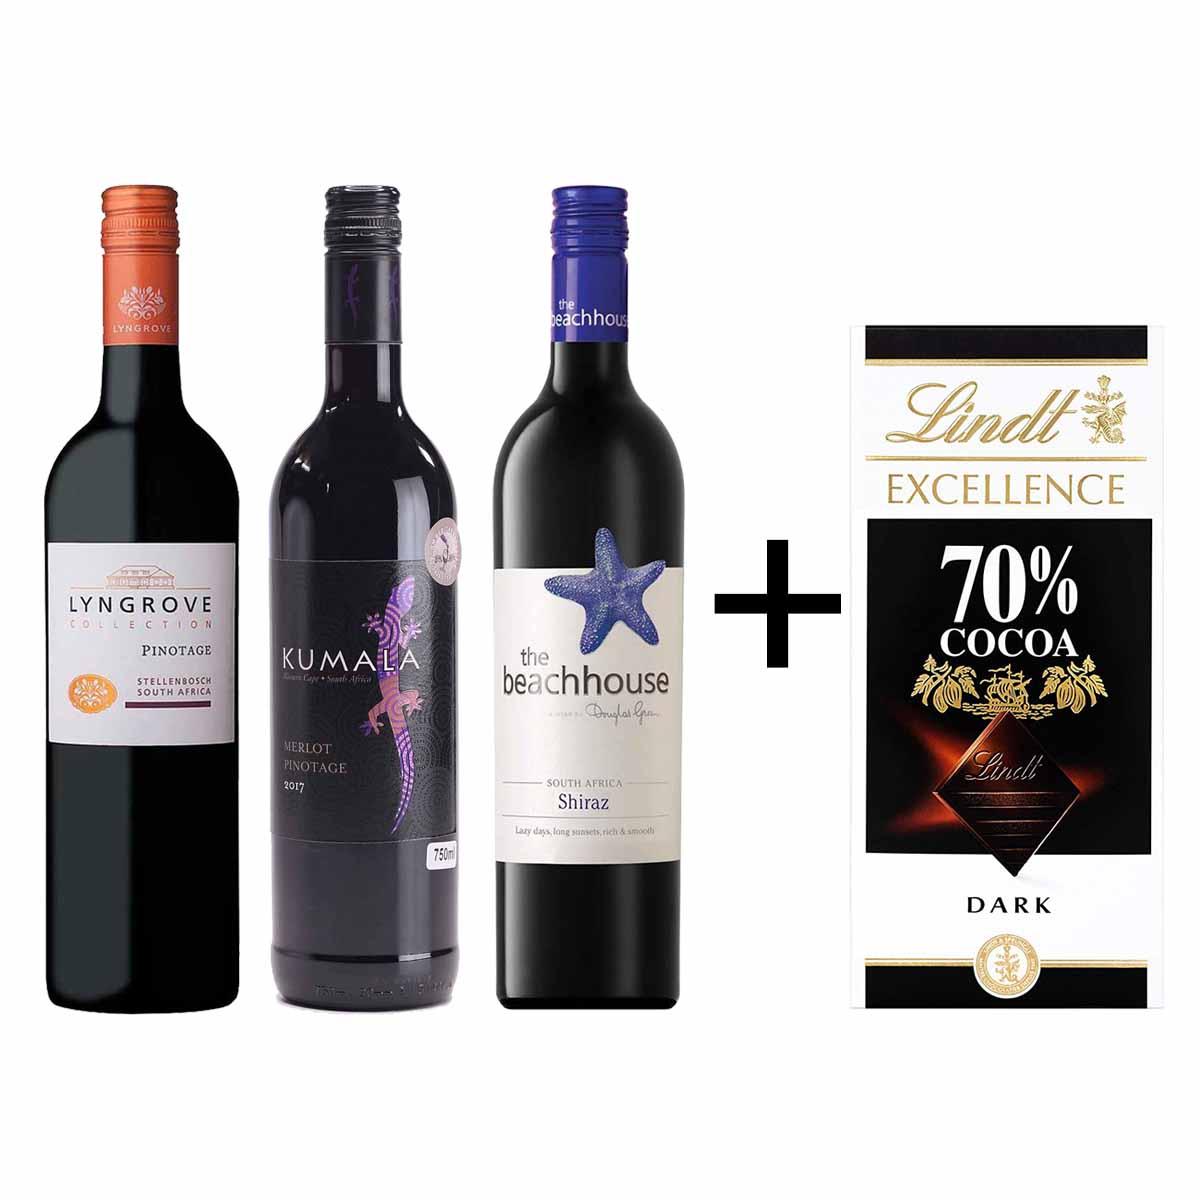 Kit 3x Vinho Sul-Africano Lyngrove/Kumala/Beachhouse + Lindt 70%